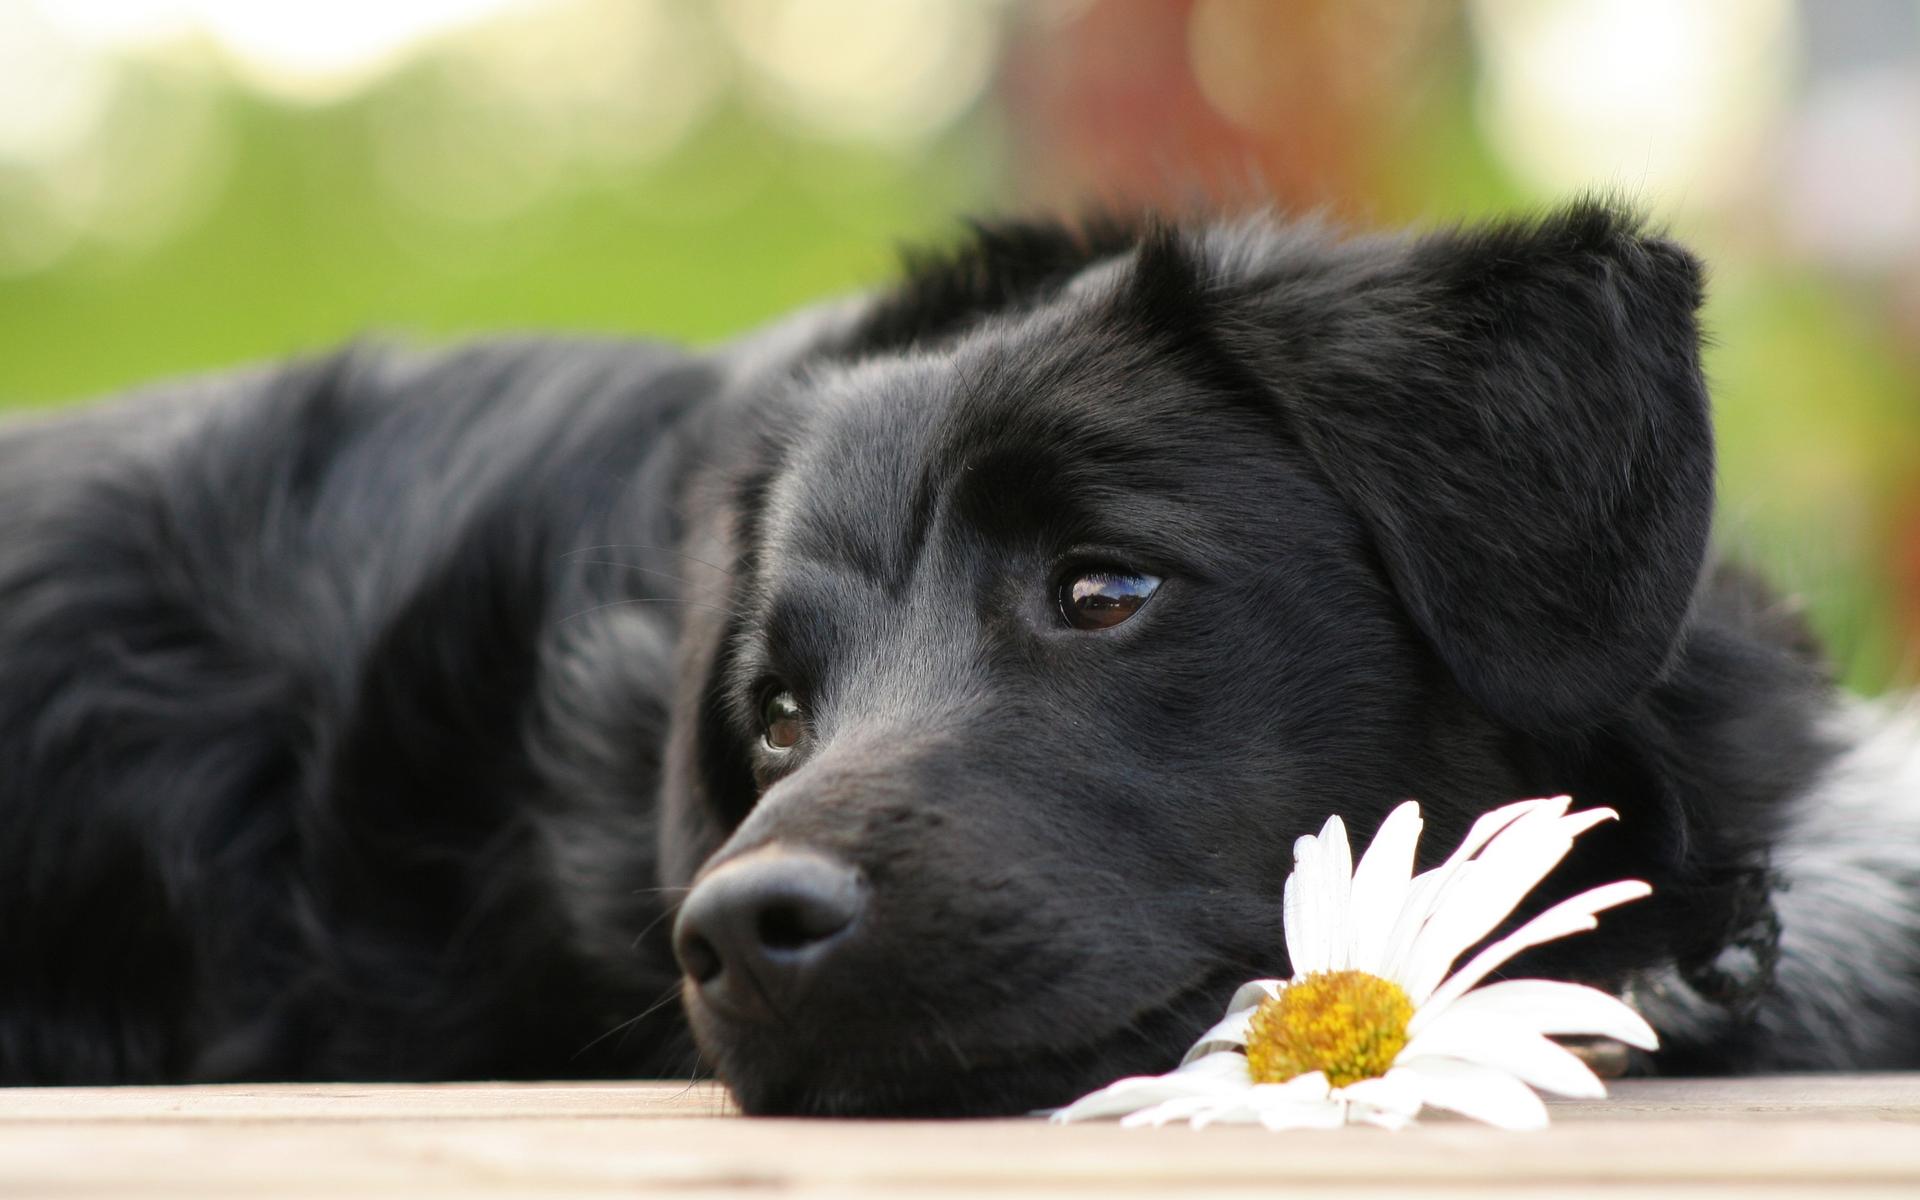 Simple Labrador Retriever Black Adorable Dog - Cute-Black-Labrador-Retriever-Innocent-Puppy-Wallpaper  Pictures_258498  .jpg